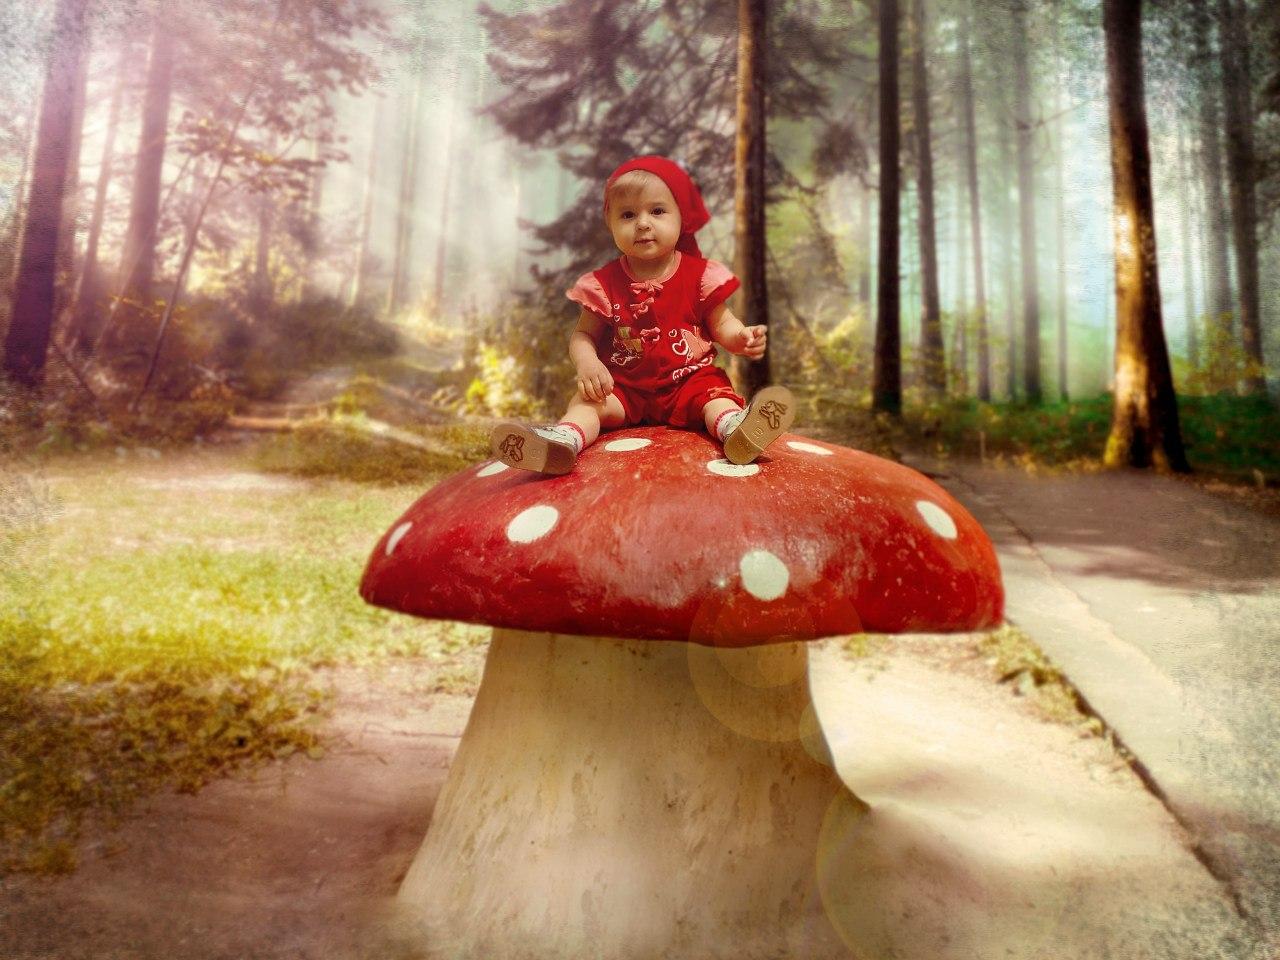 Сказка про красную шапочку ххх 26 фотография